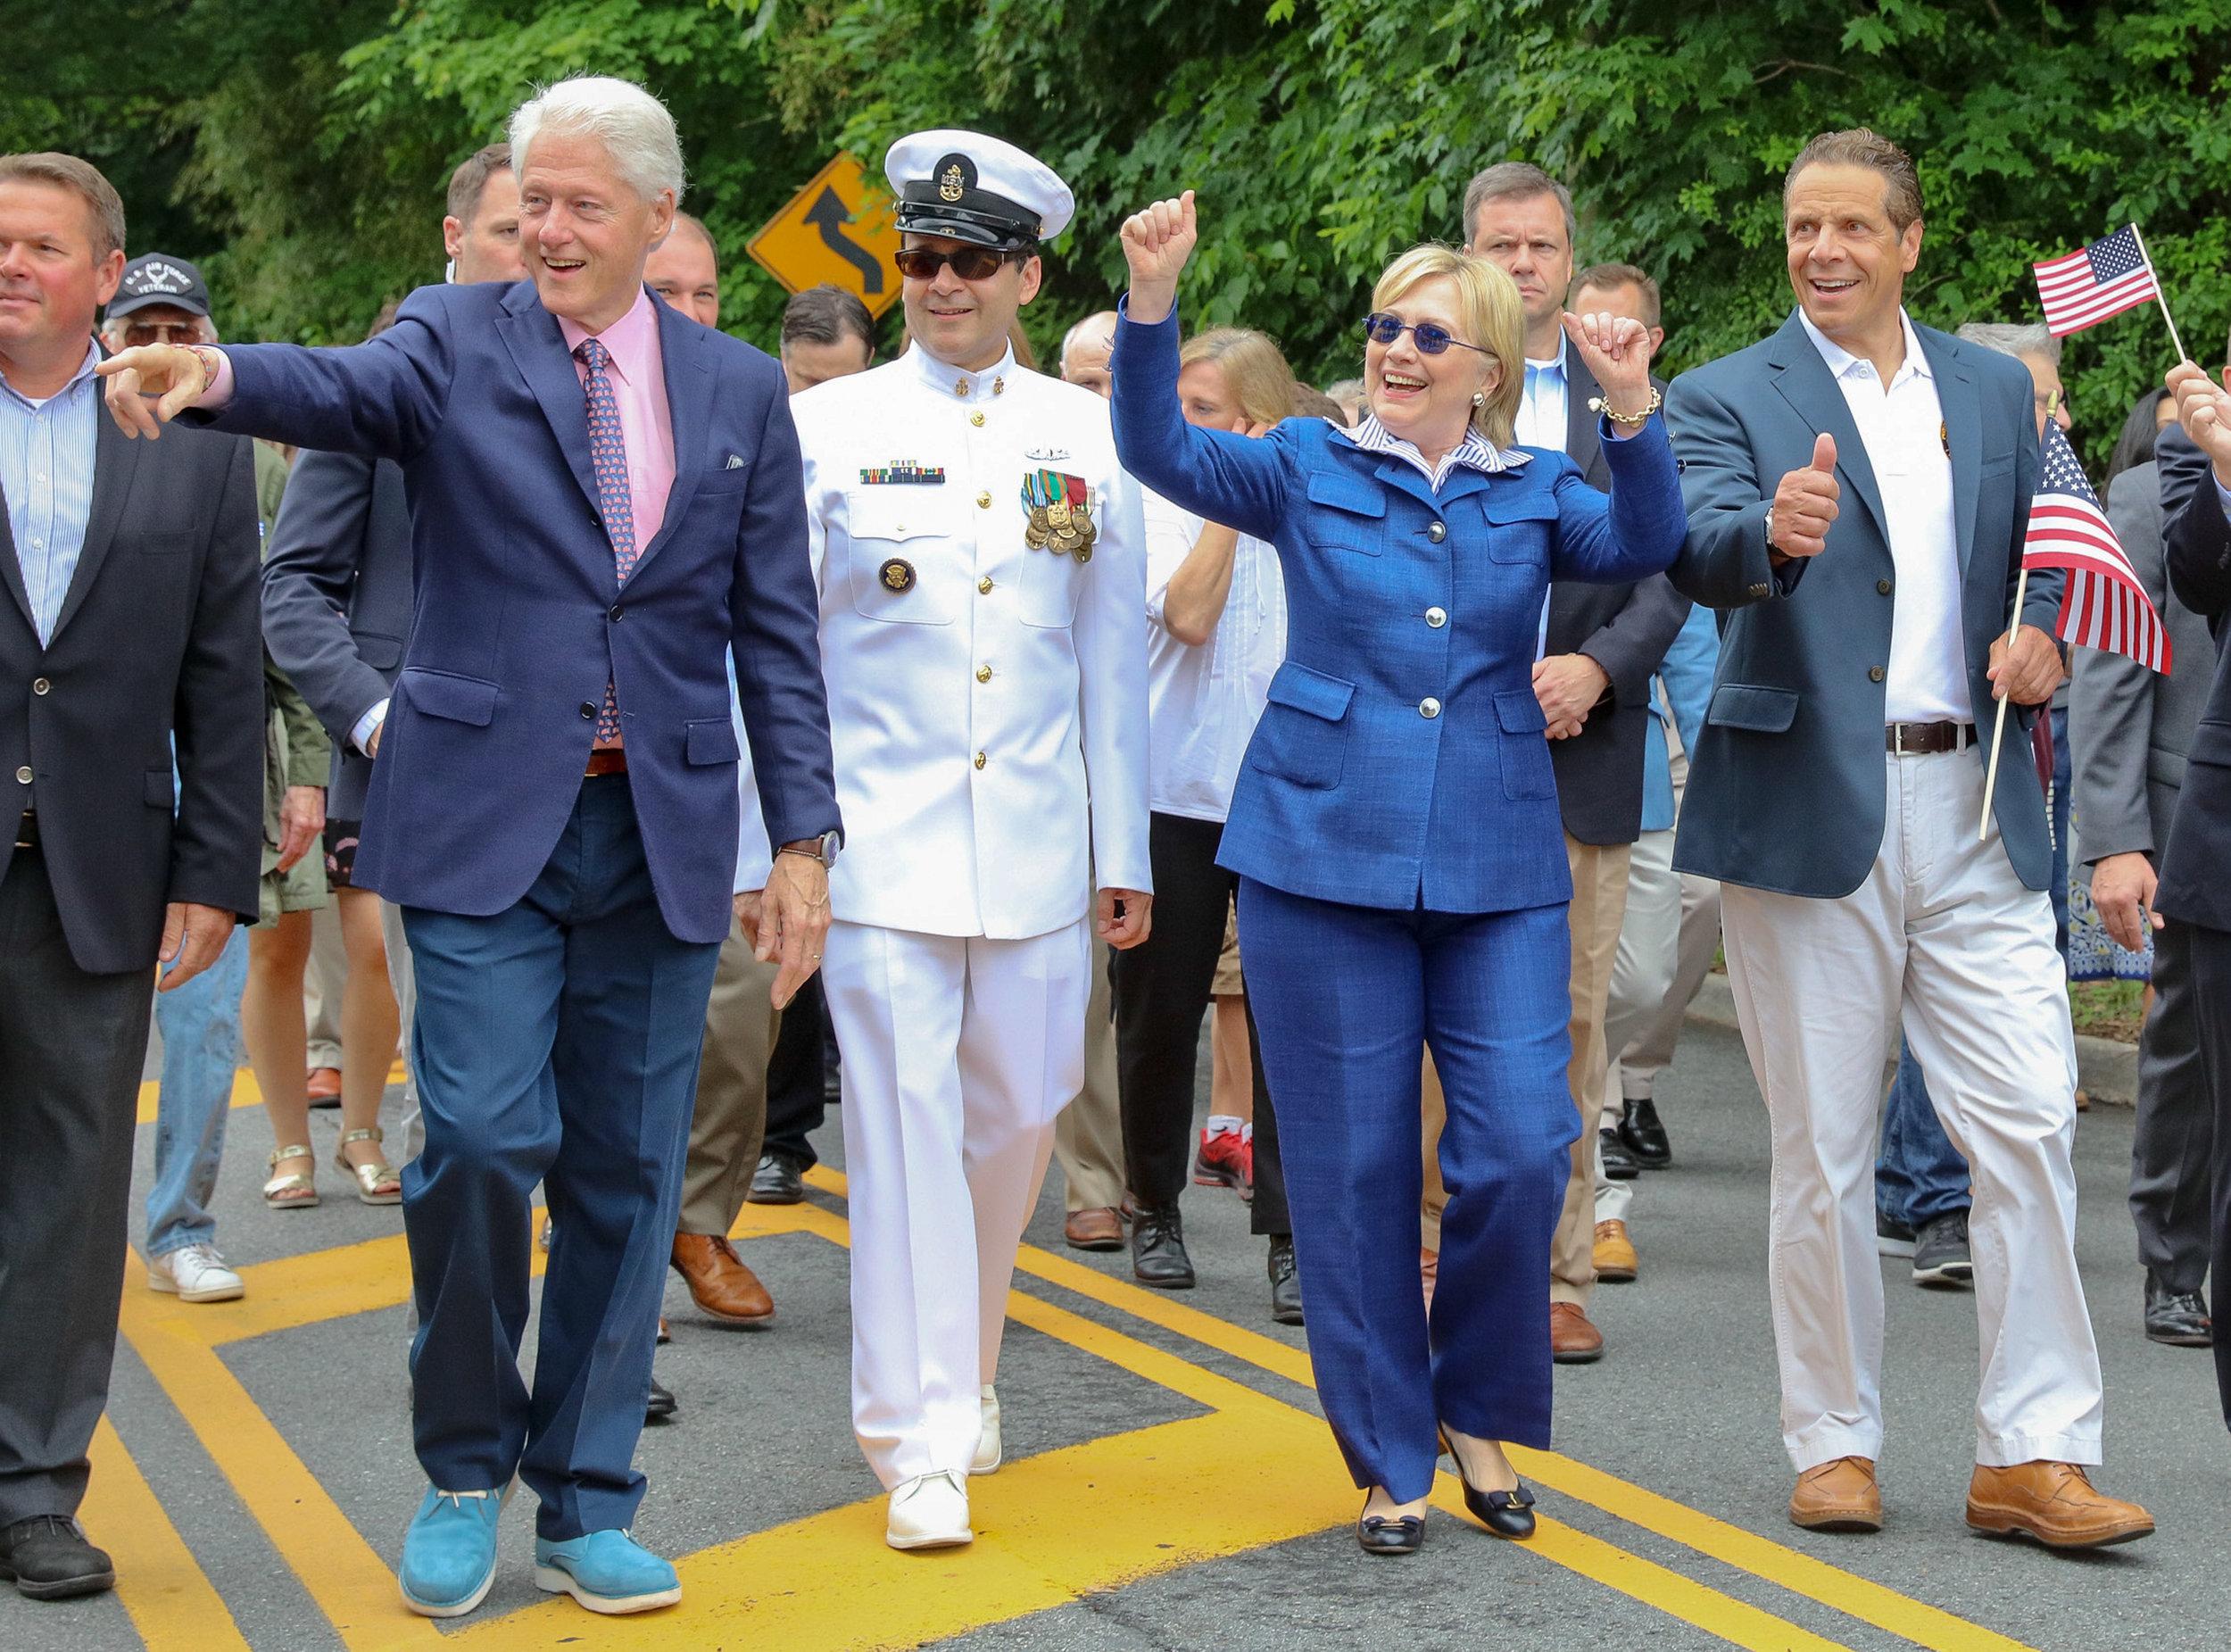 Memorial_parade_Clintons-11.jpg